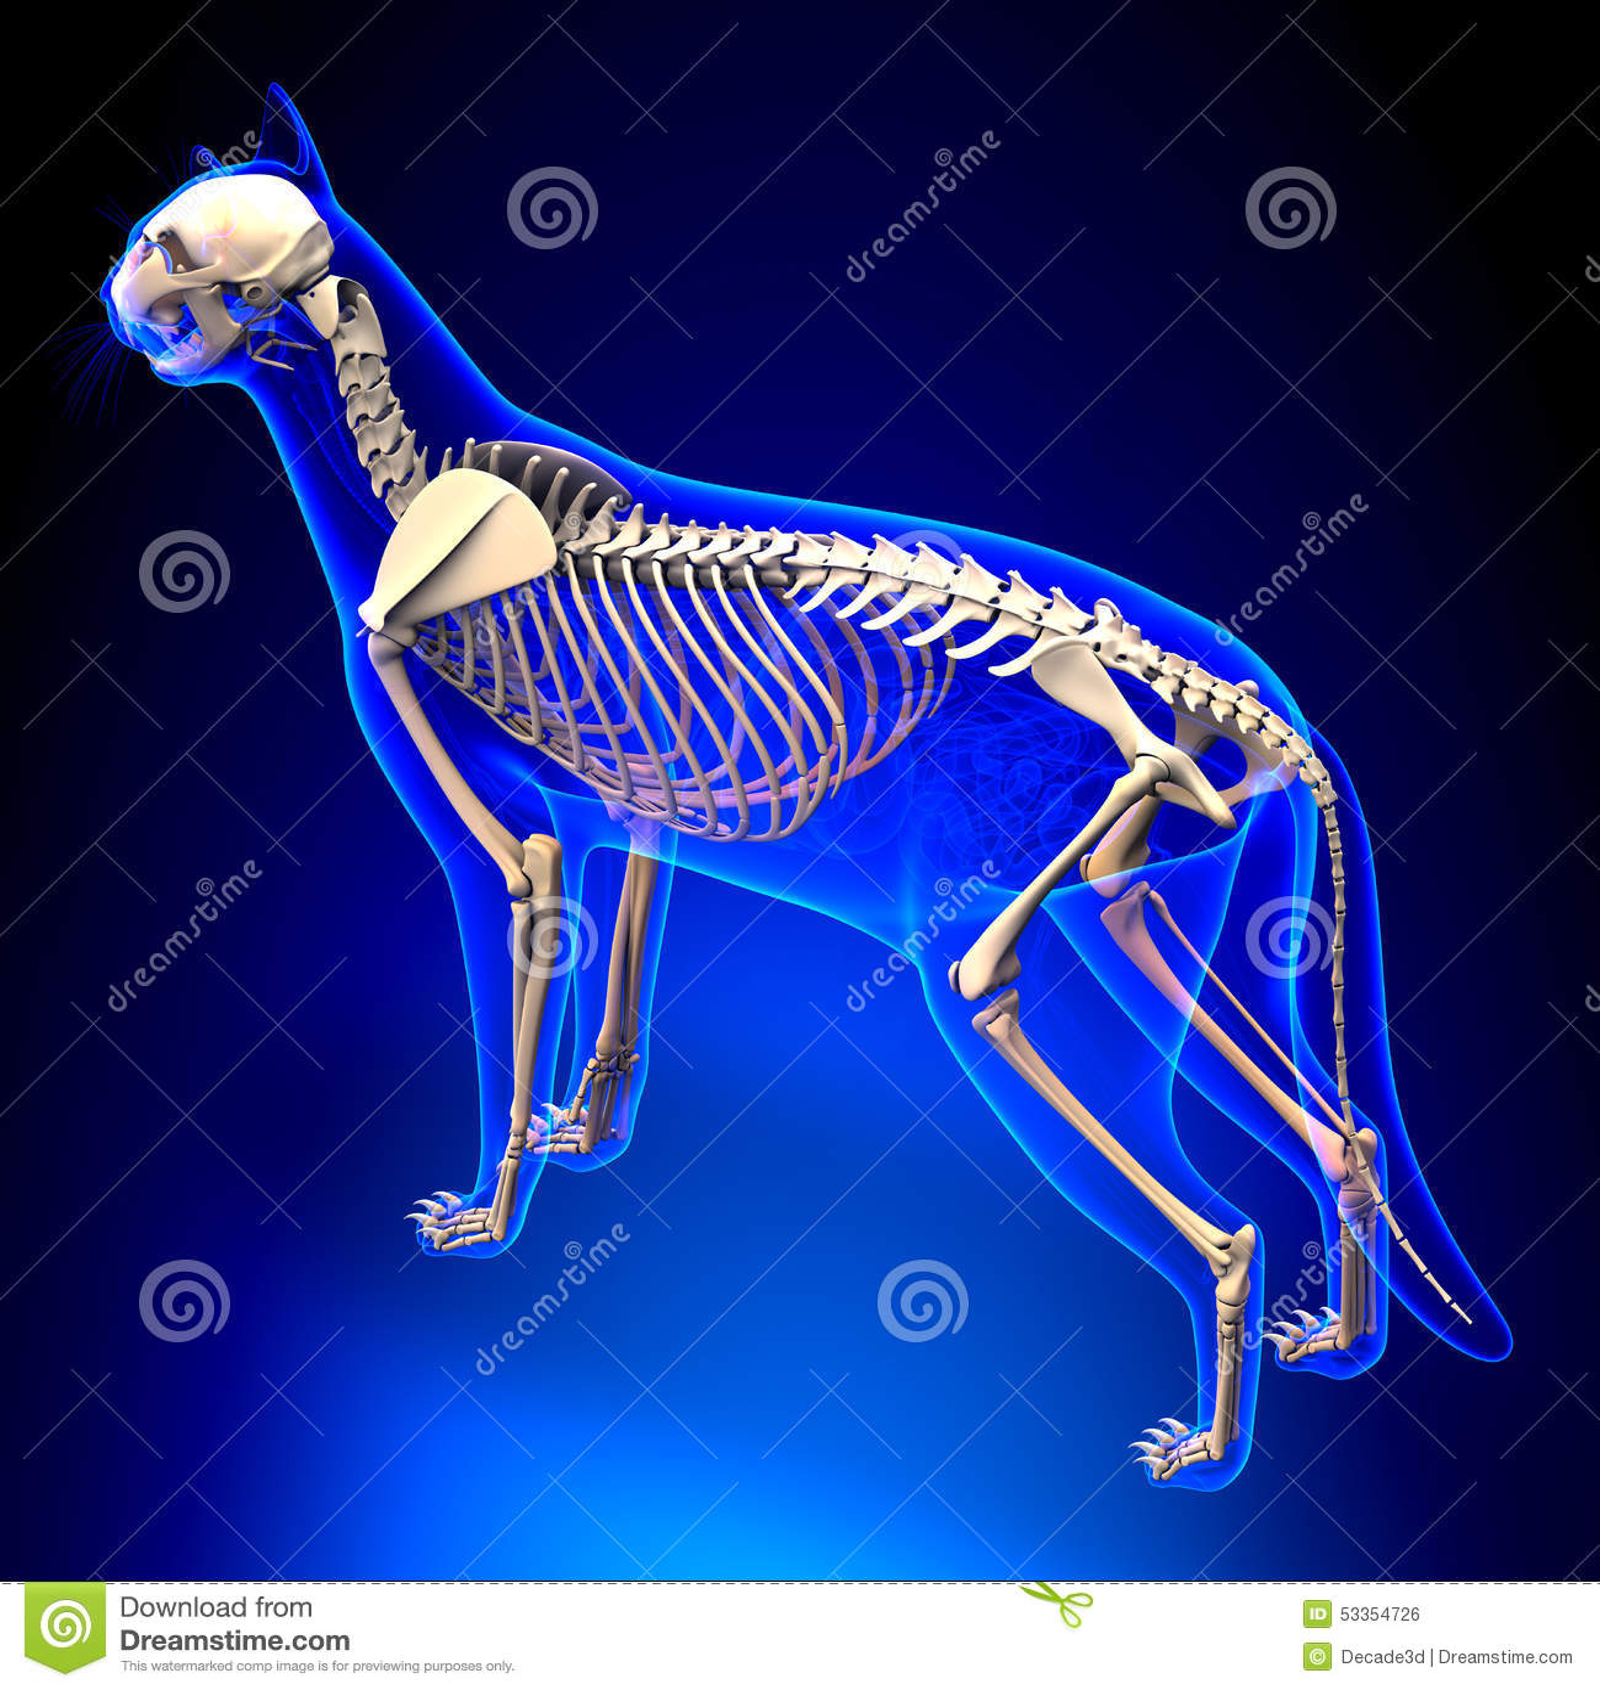 Cat Skeleton Anatomy - Anatomy Of A Cat Skeleton - Perspective V ...